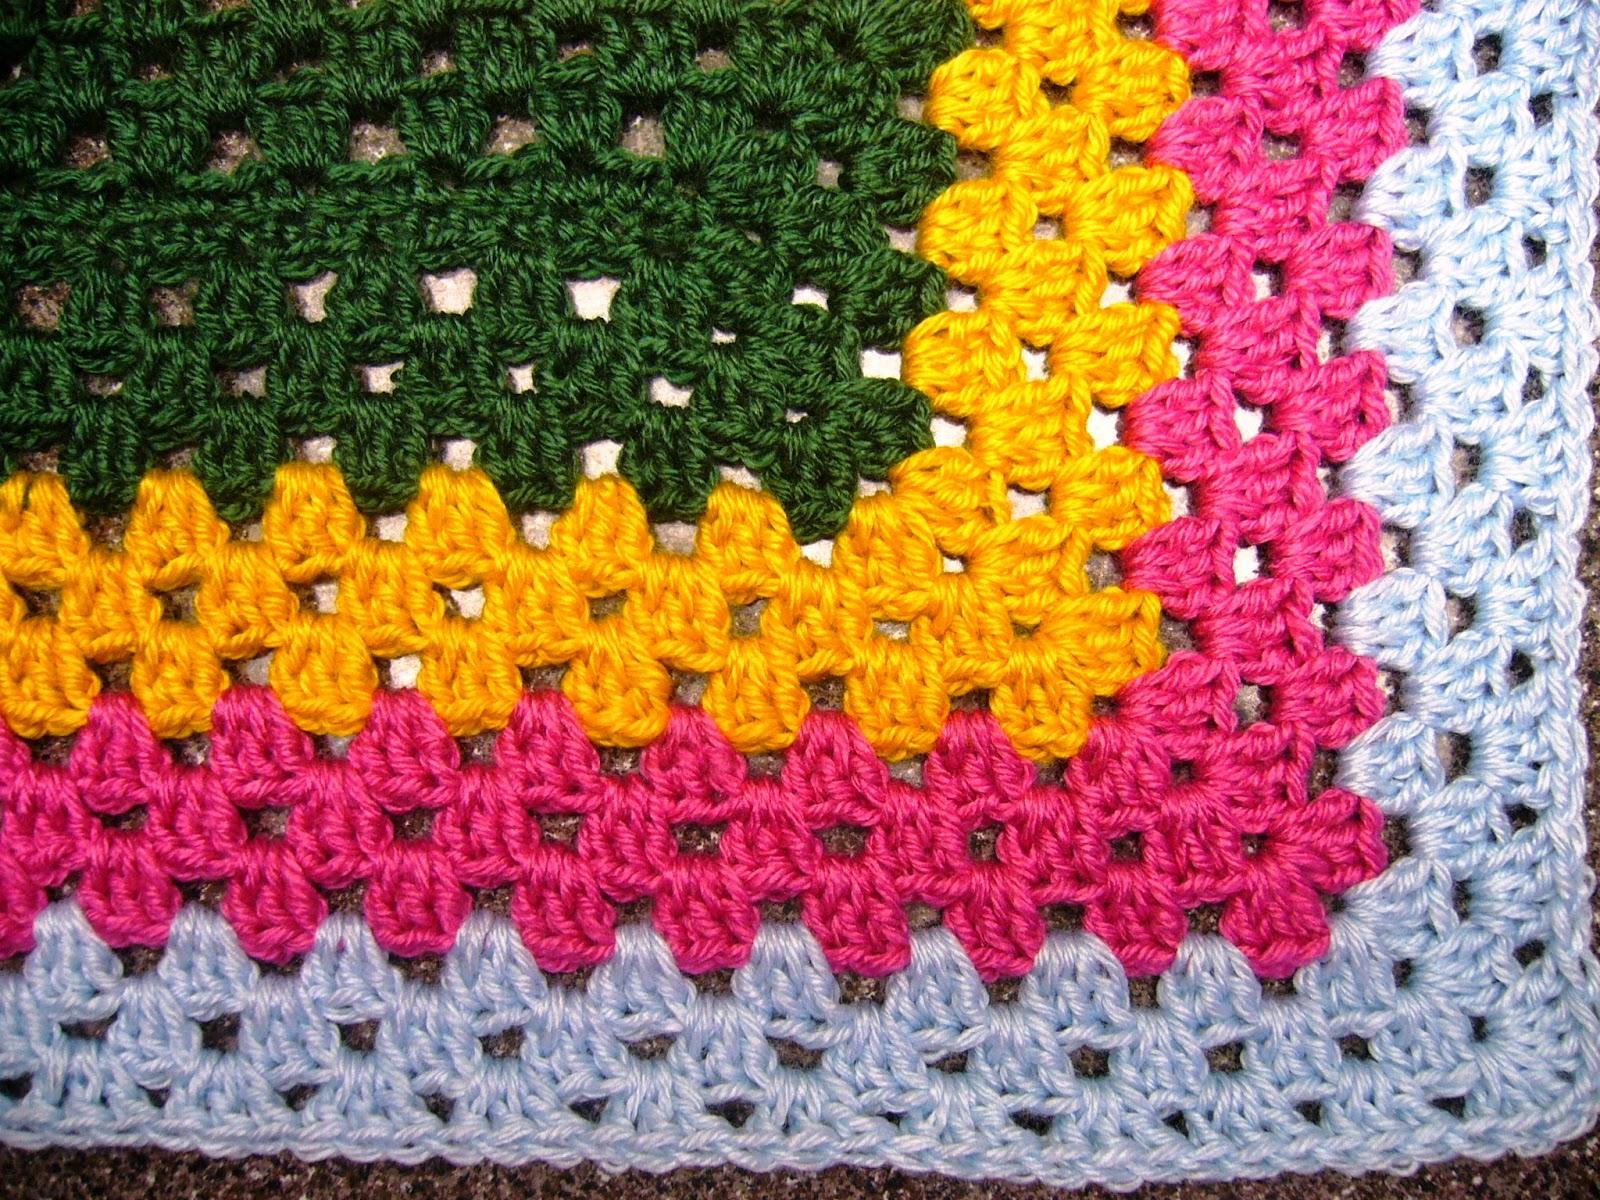 Granny square bitty blanket